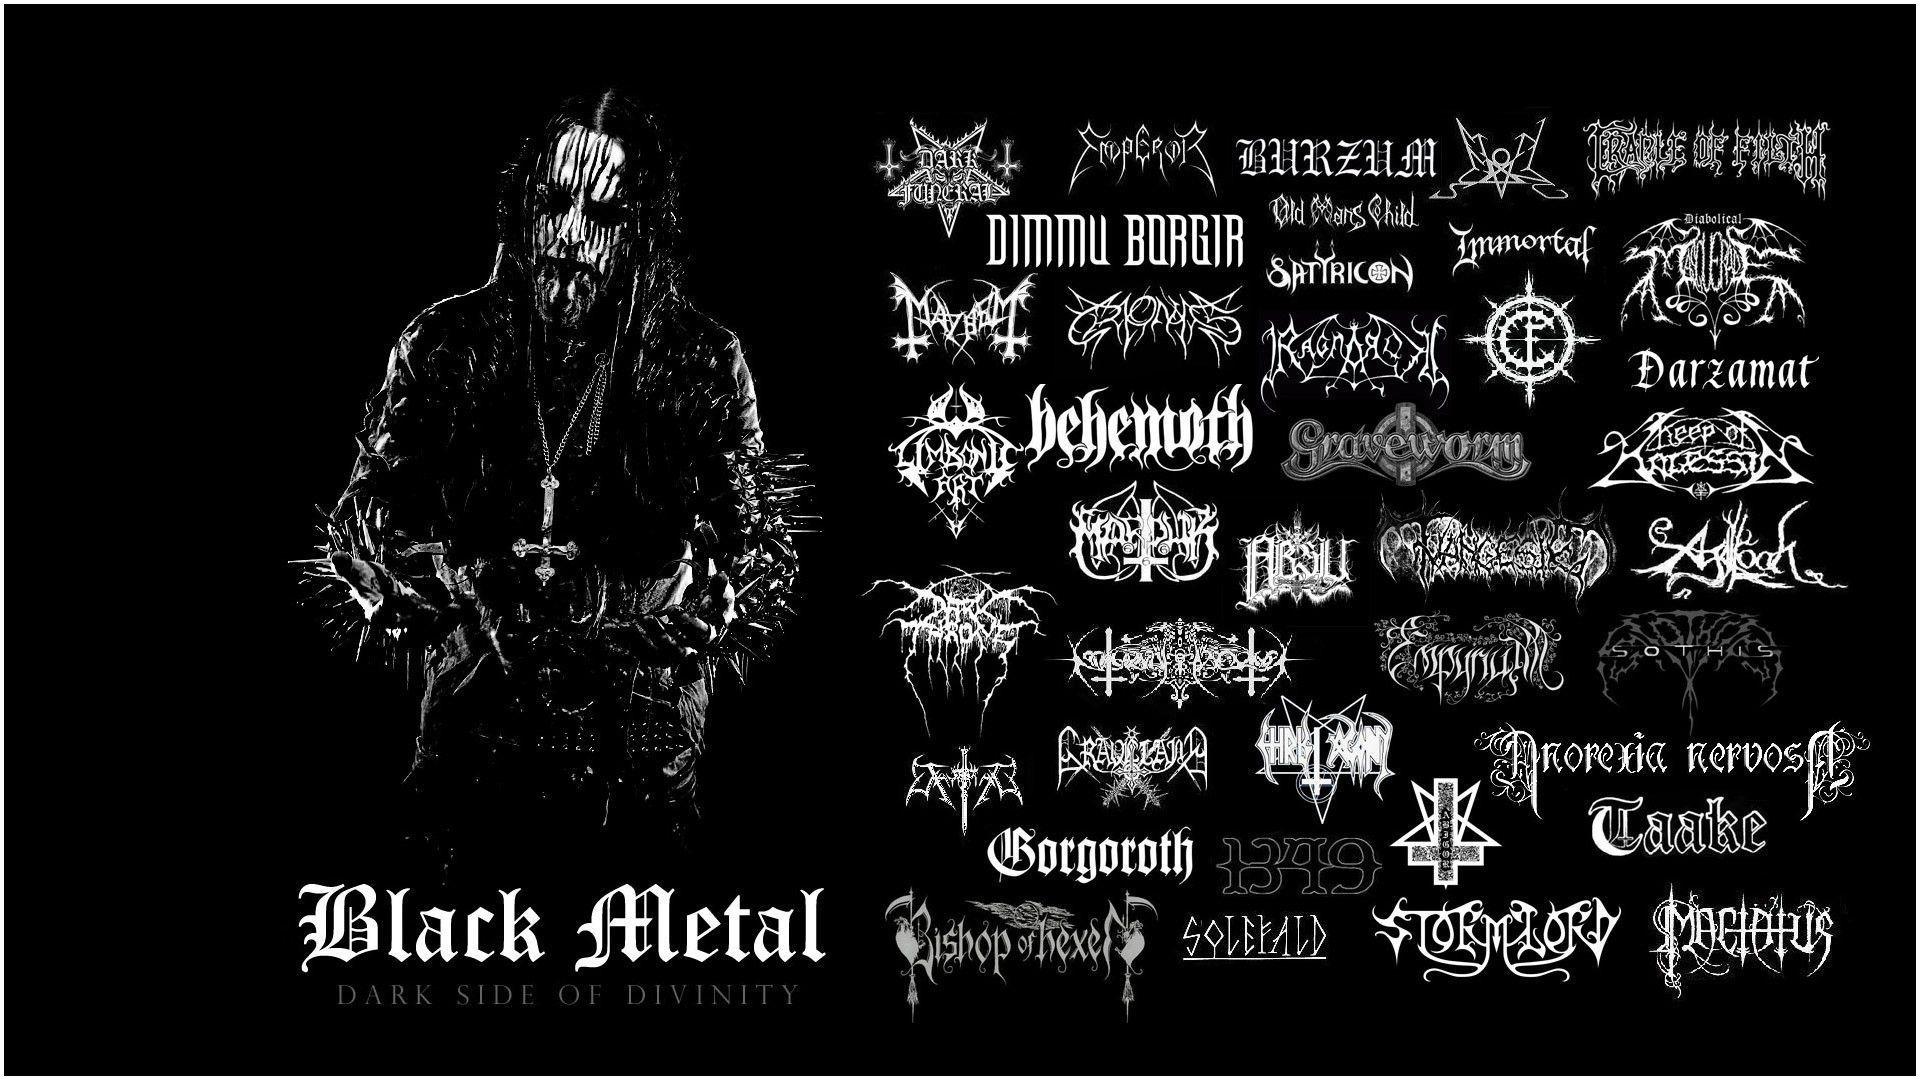 Black Metal Wallpaper Wallpaper Hd